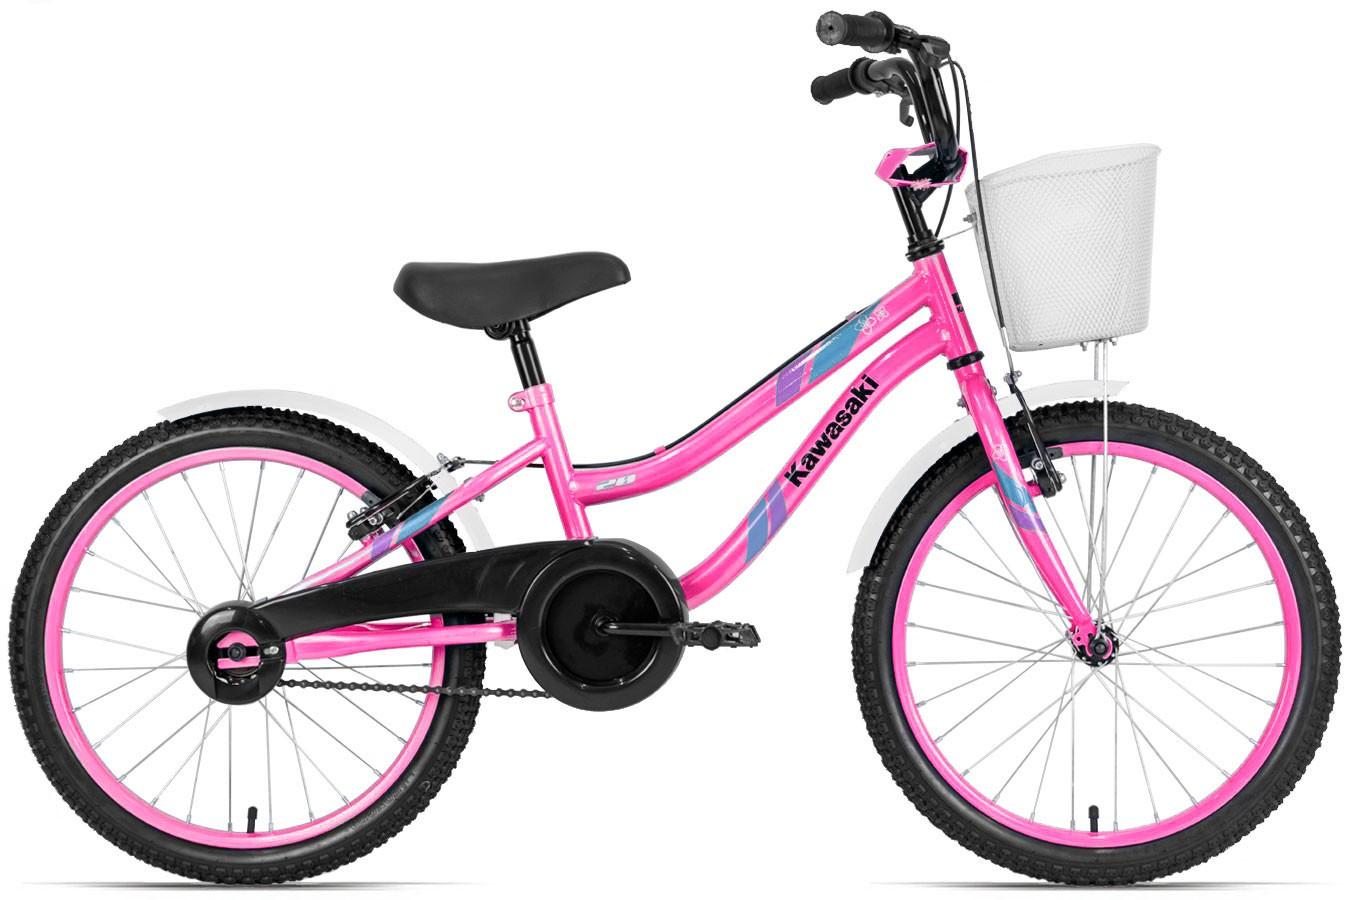 Bicicleta aro 20 Feminina Rosa - Kawasaki